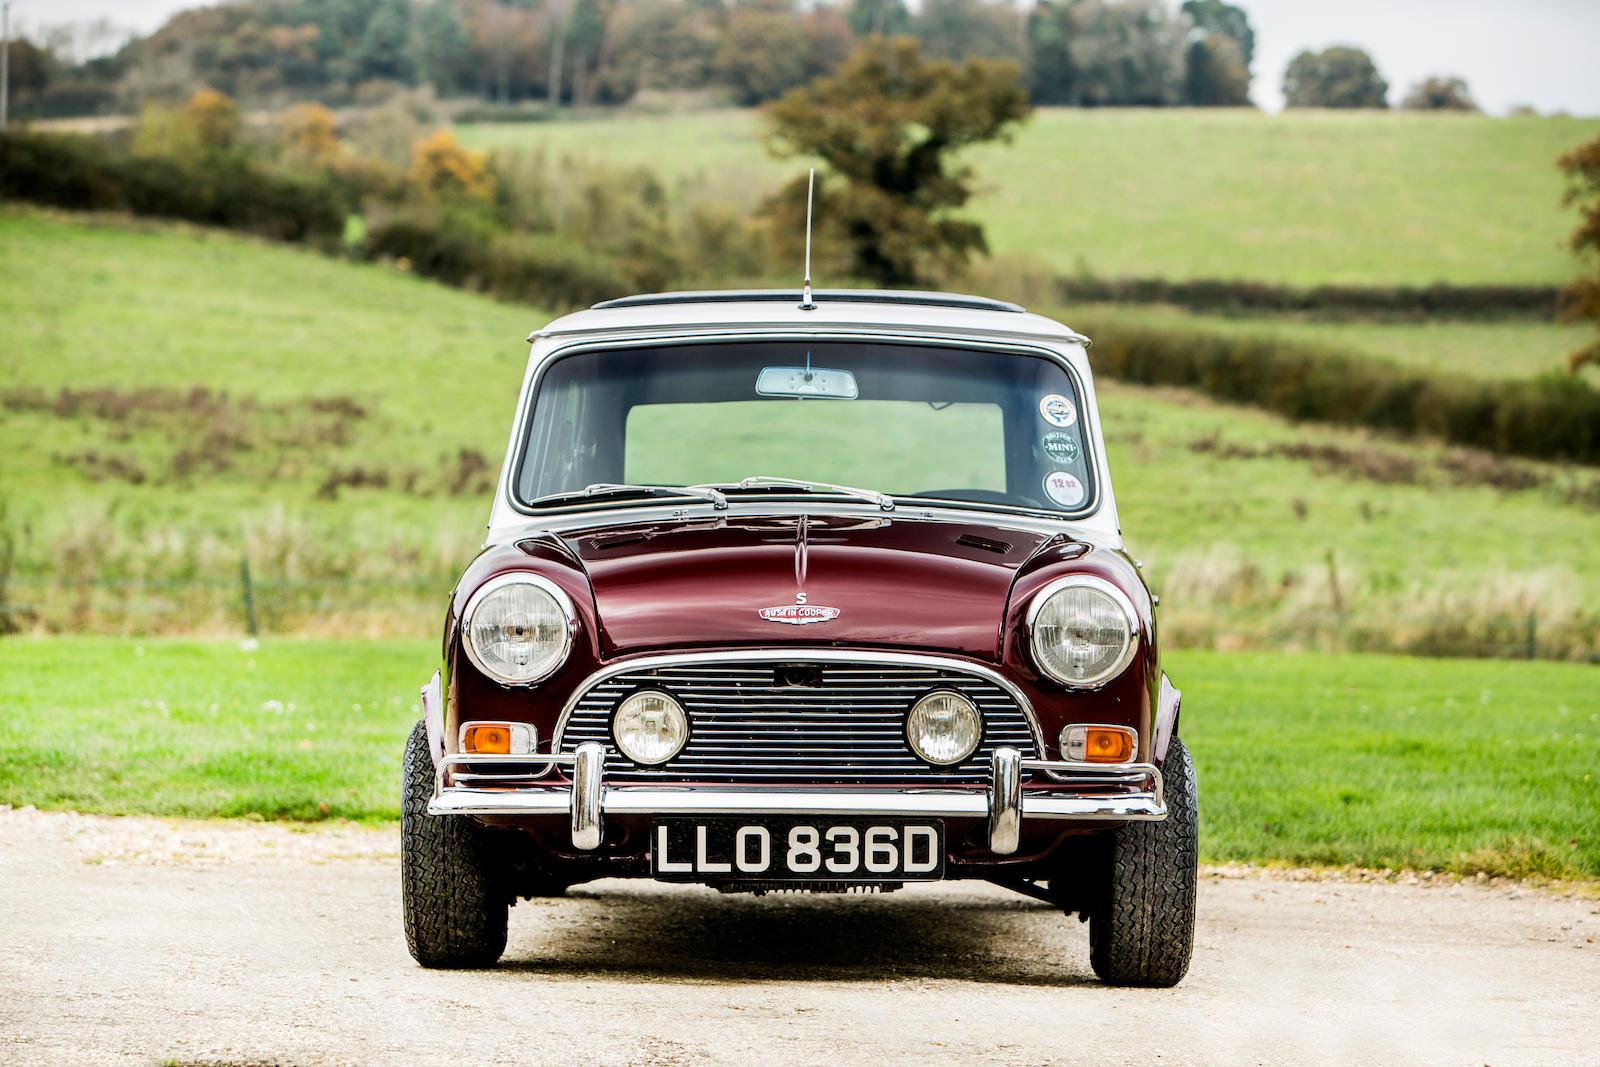 1966 Austin Mini Cooper S front